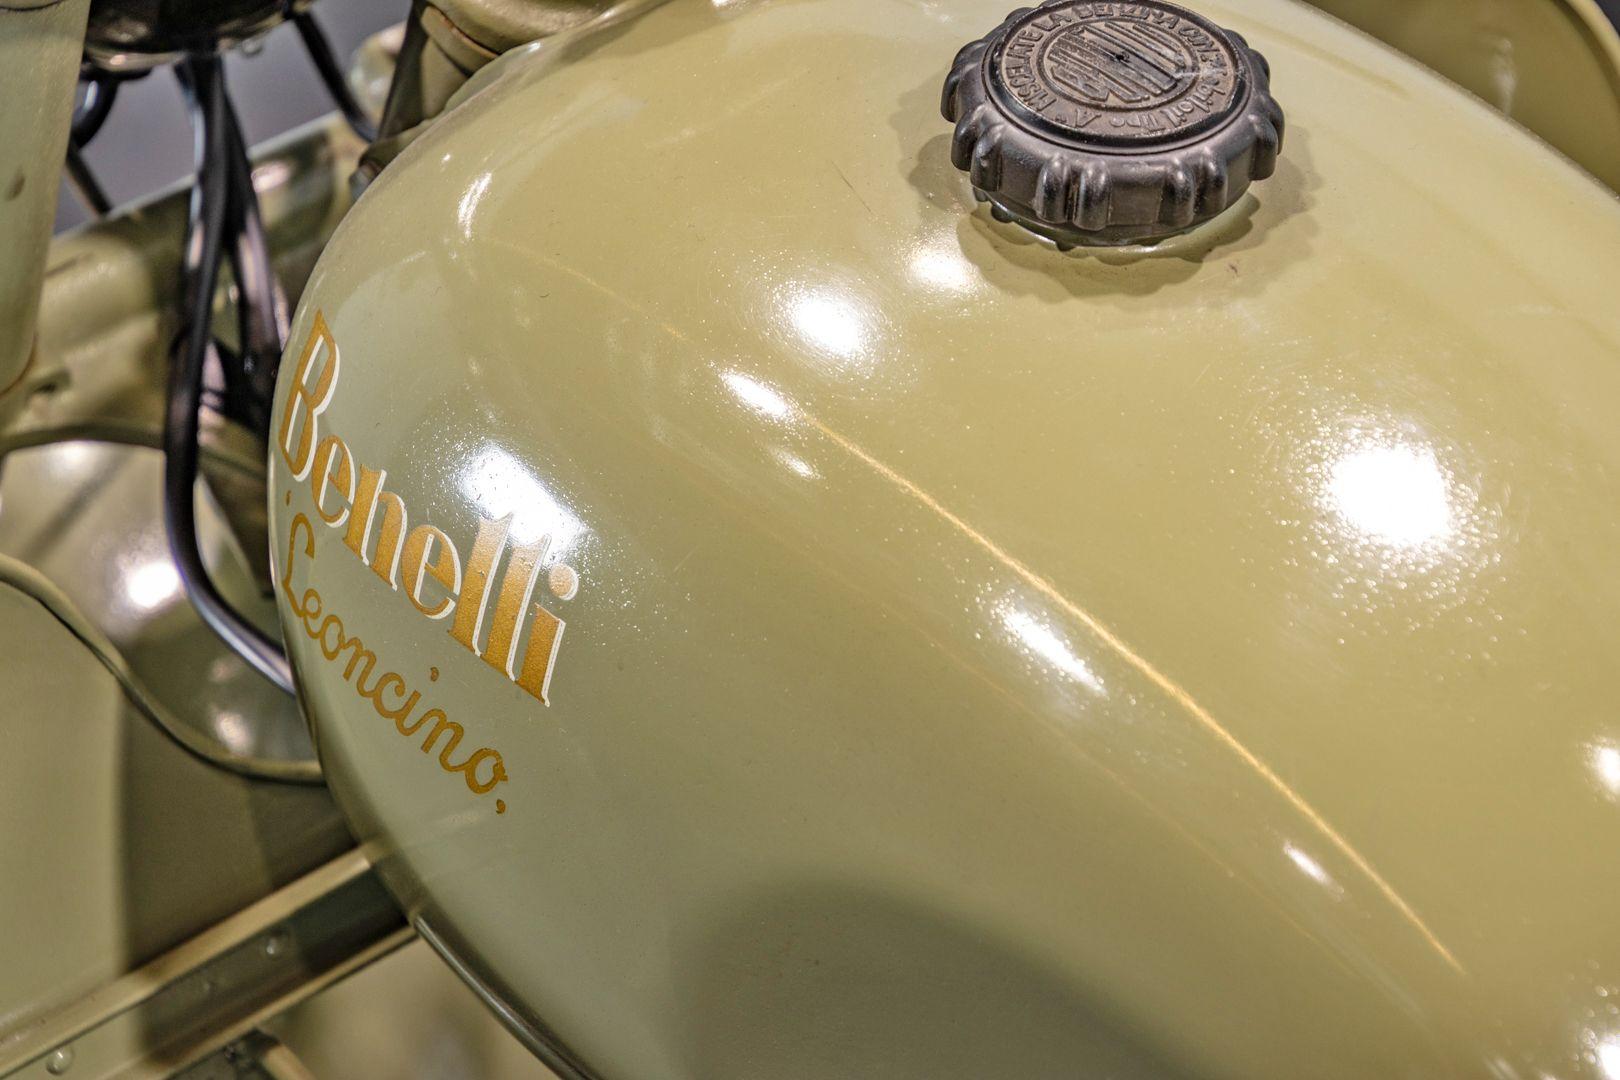 1956 Benelli 125 Leoncino Rikshaws 74326